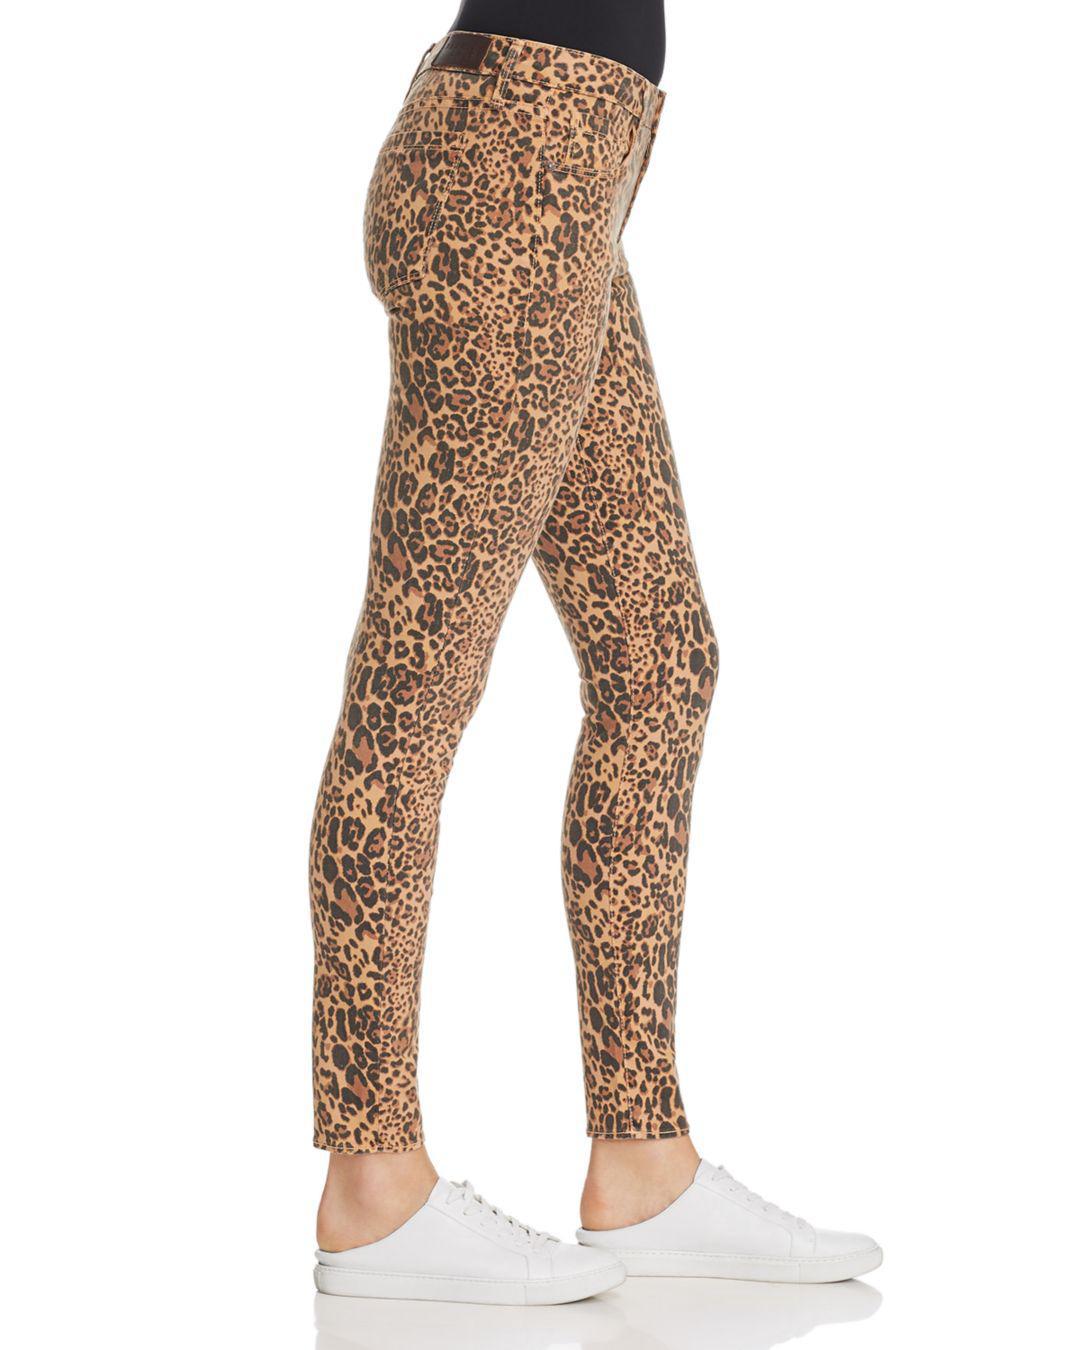 615e92dbd81 Parker Smith - Brown Ava Skinny Jeans In Leopard - Lyst. View fullscreen